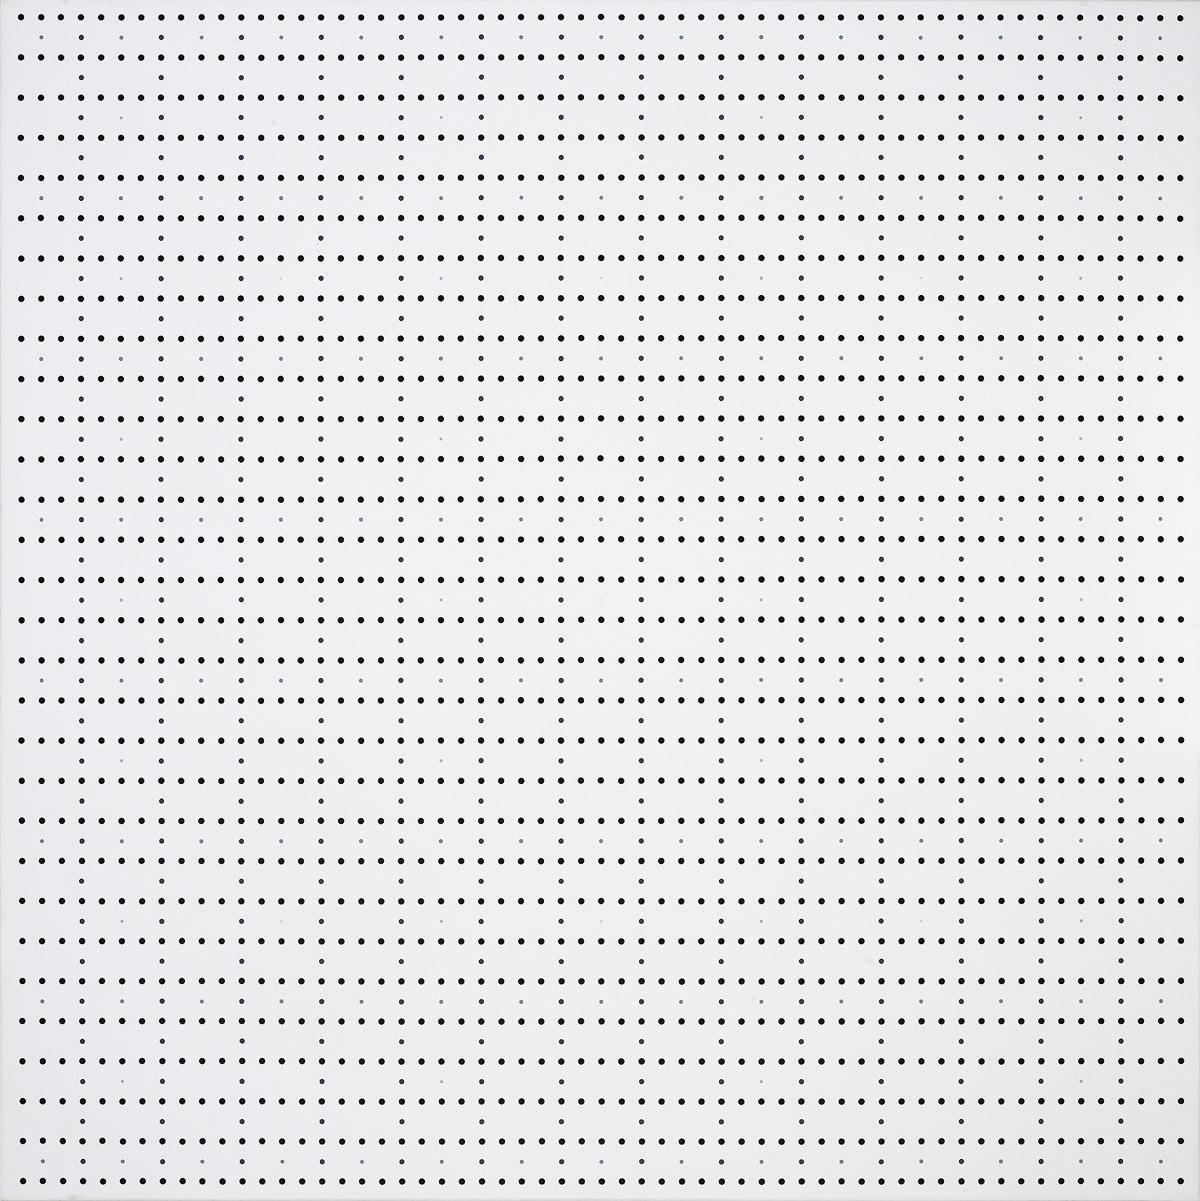 Prevalenze, 1974, minimo (nero) grigio,acrylic on canvas, 120 x 120 cm